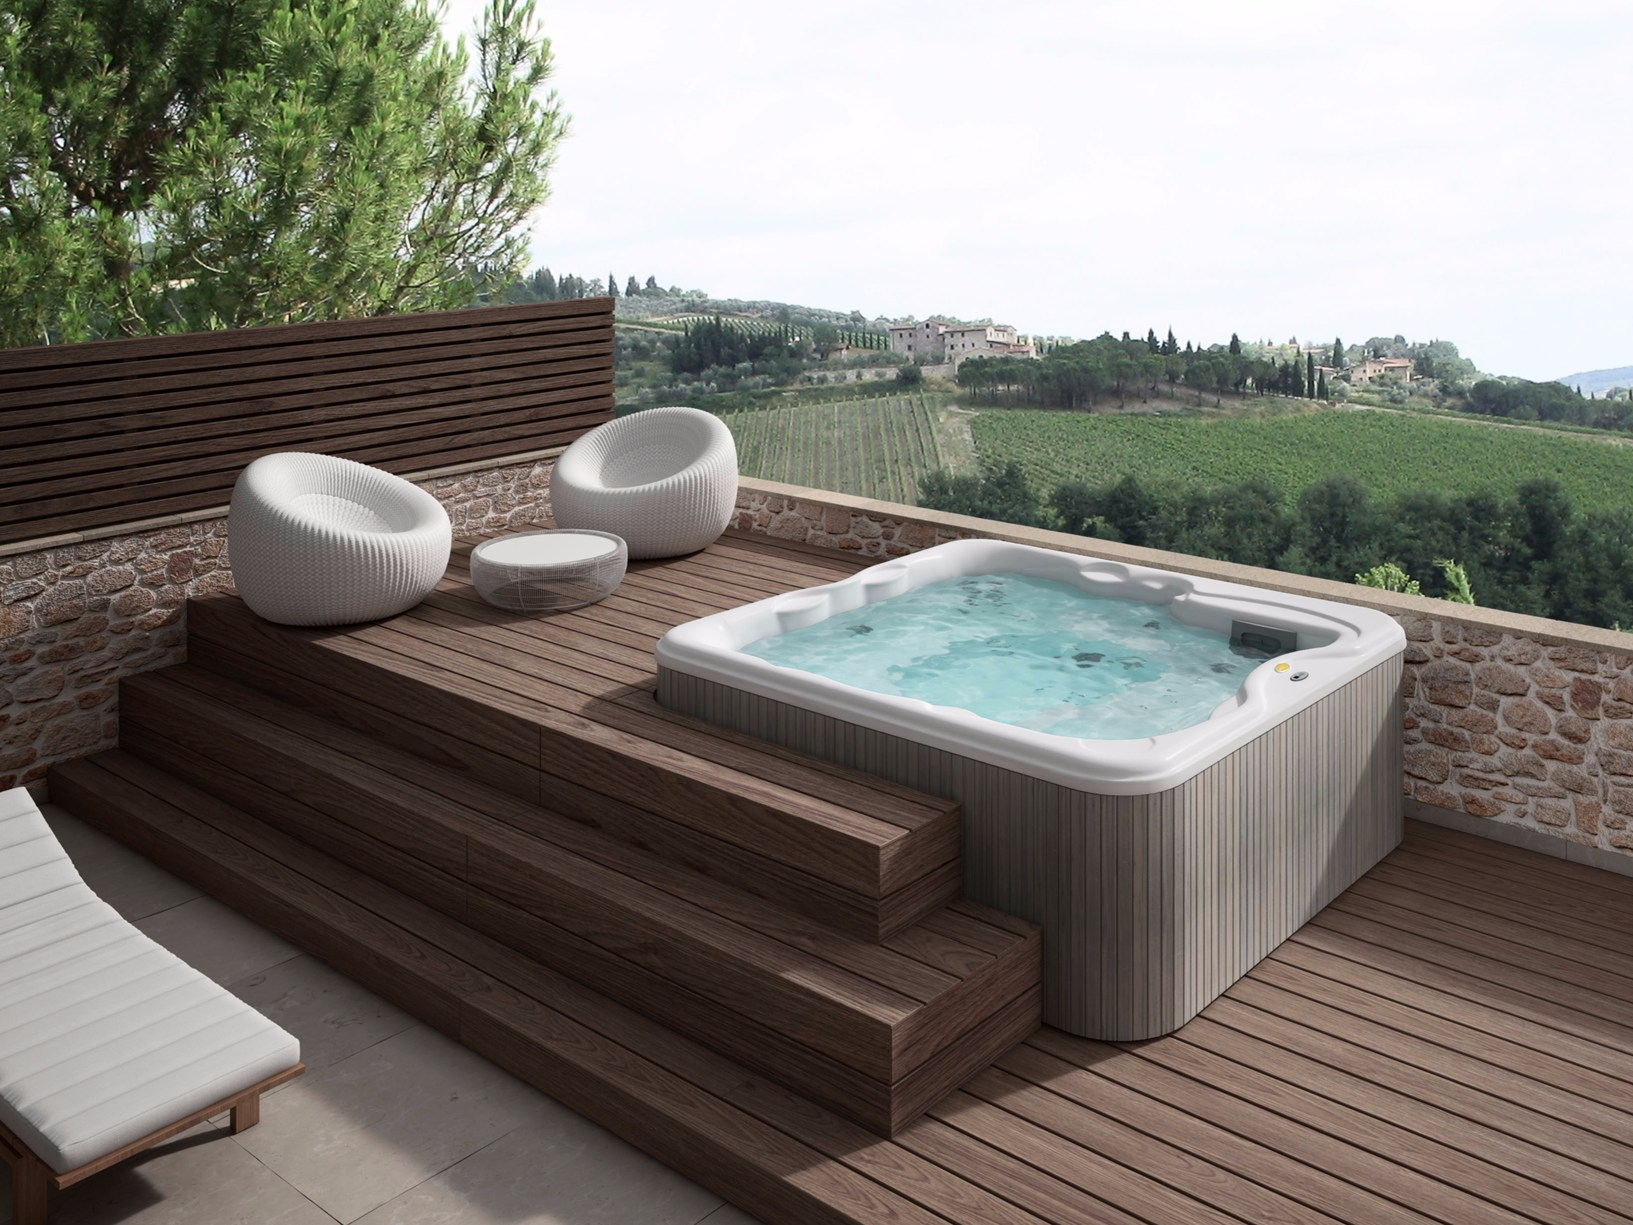 Lodge la novit jacuzzi dedicata al settore hospitality - Piscina jacuzzi da esterno ...